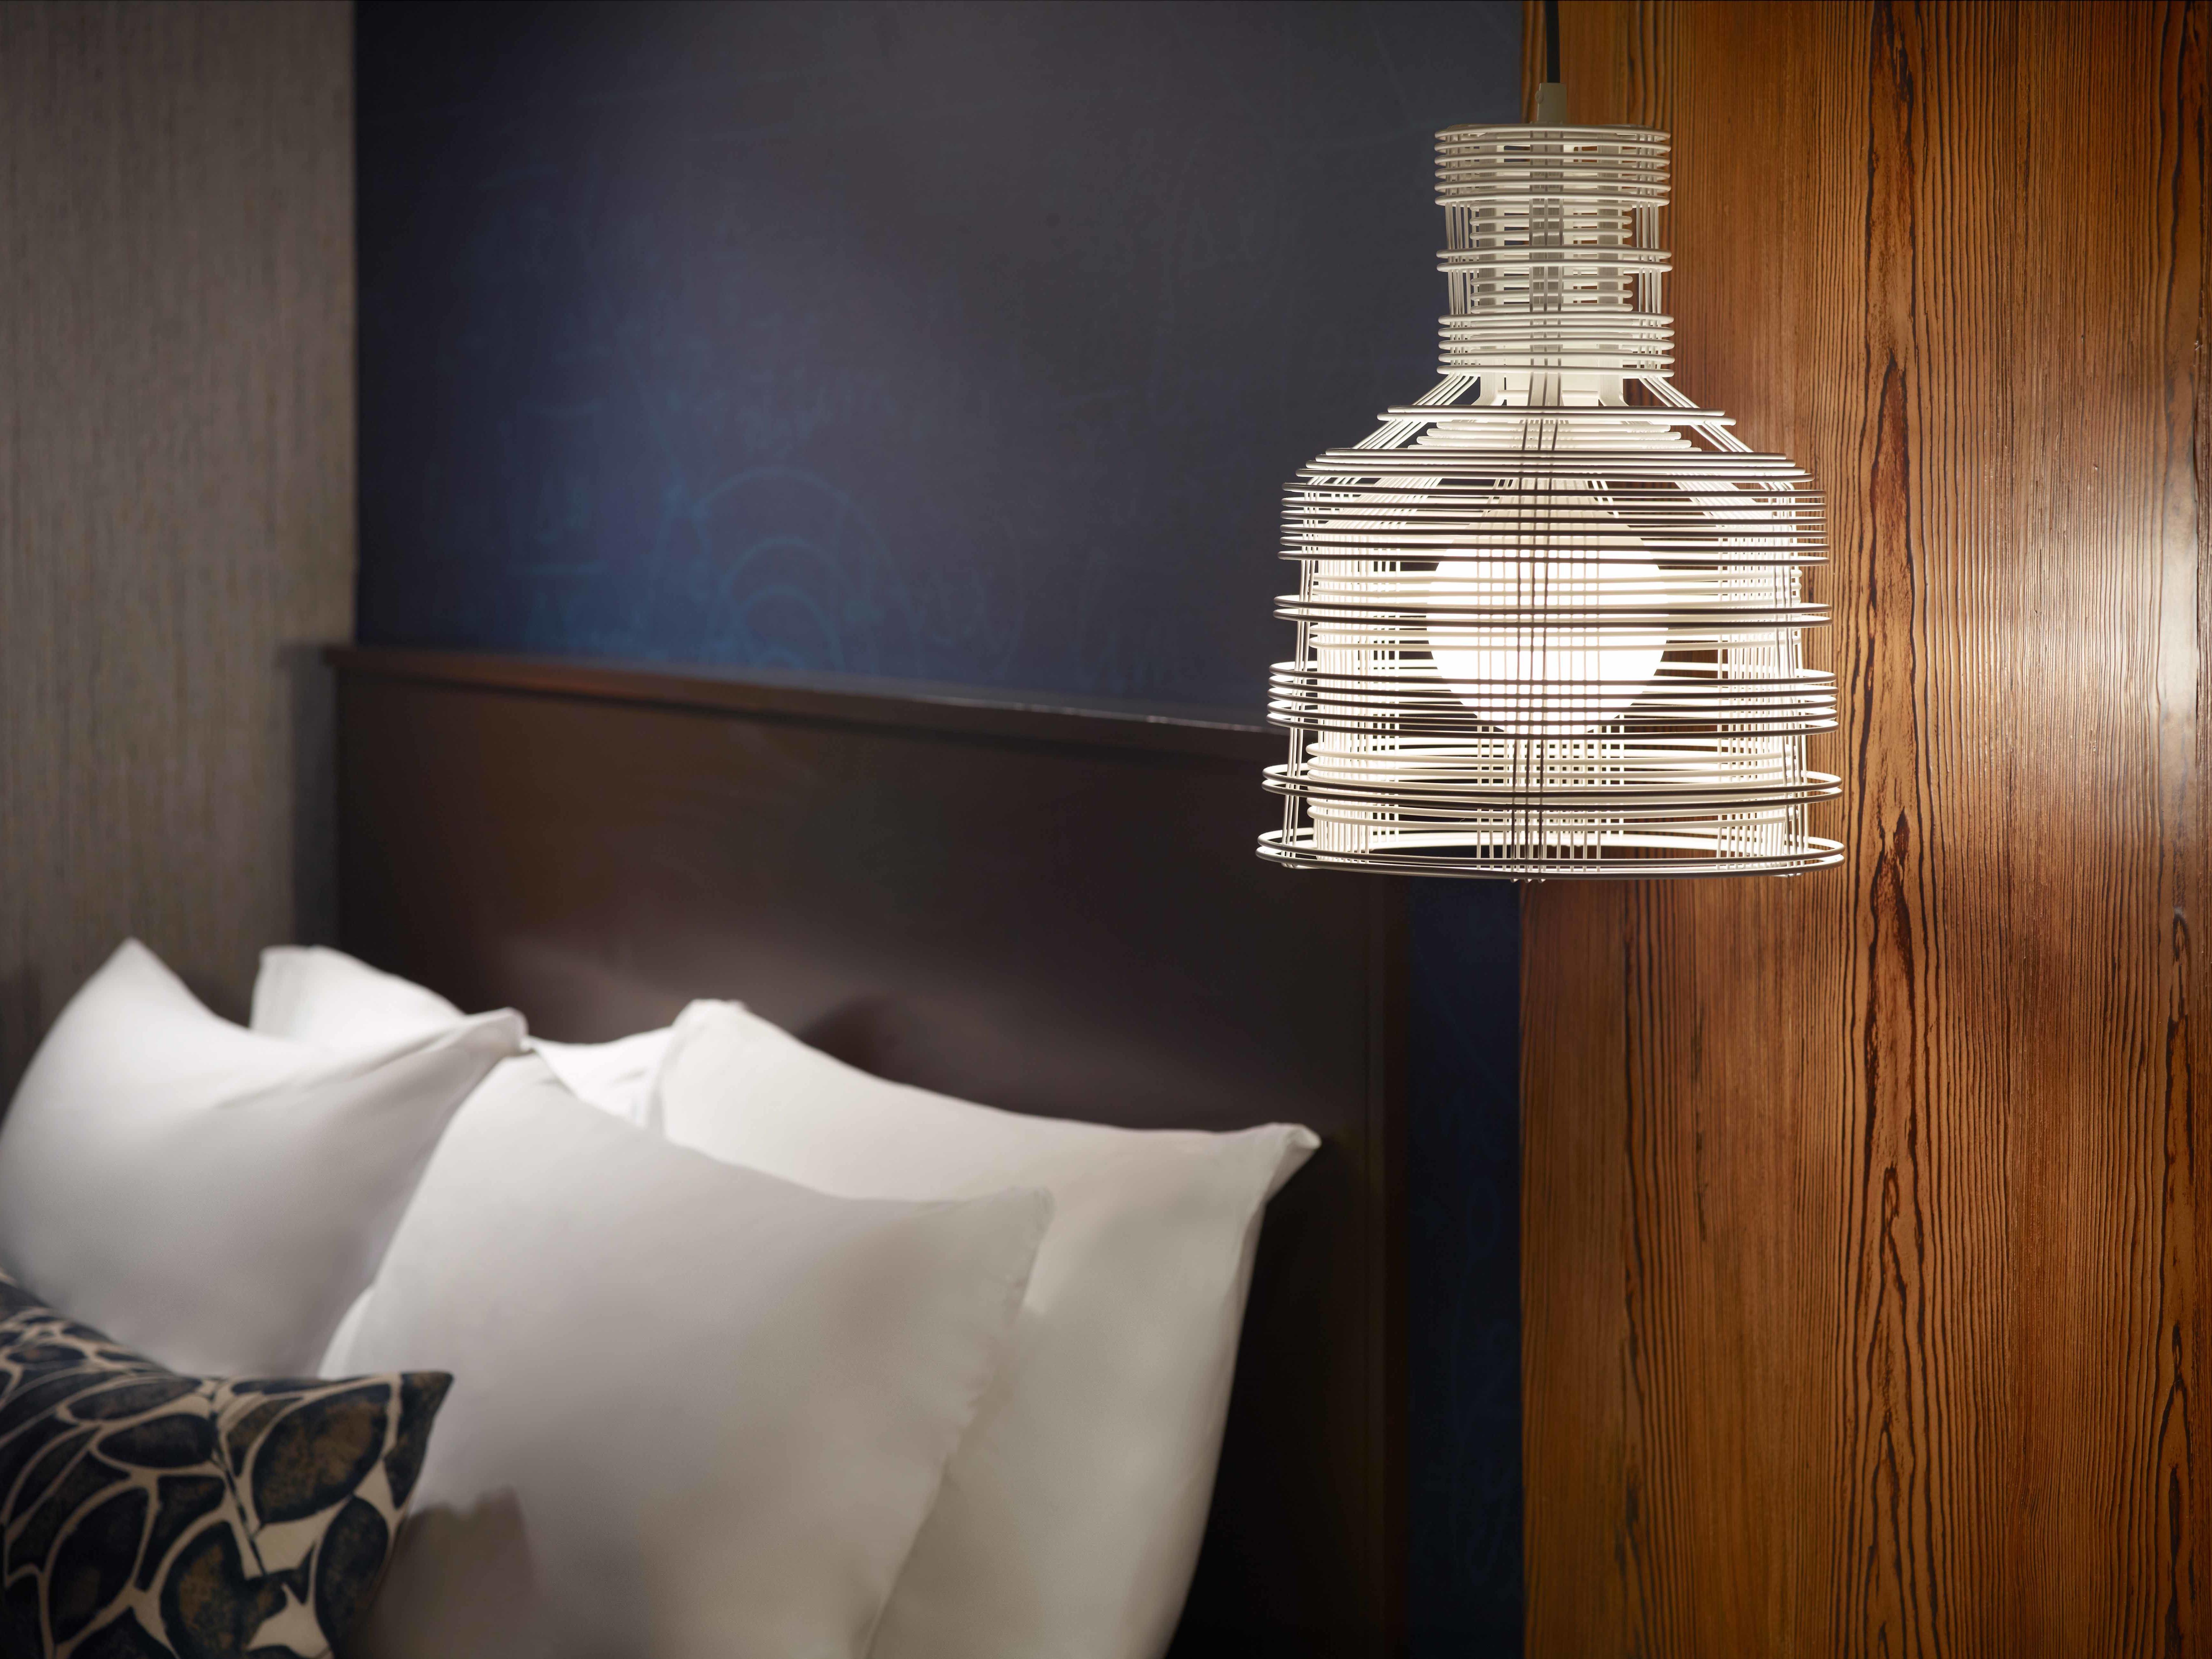 Georgia Tech Hotel Guest Room Design Feature - Lighting